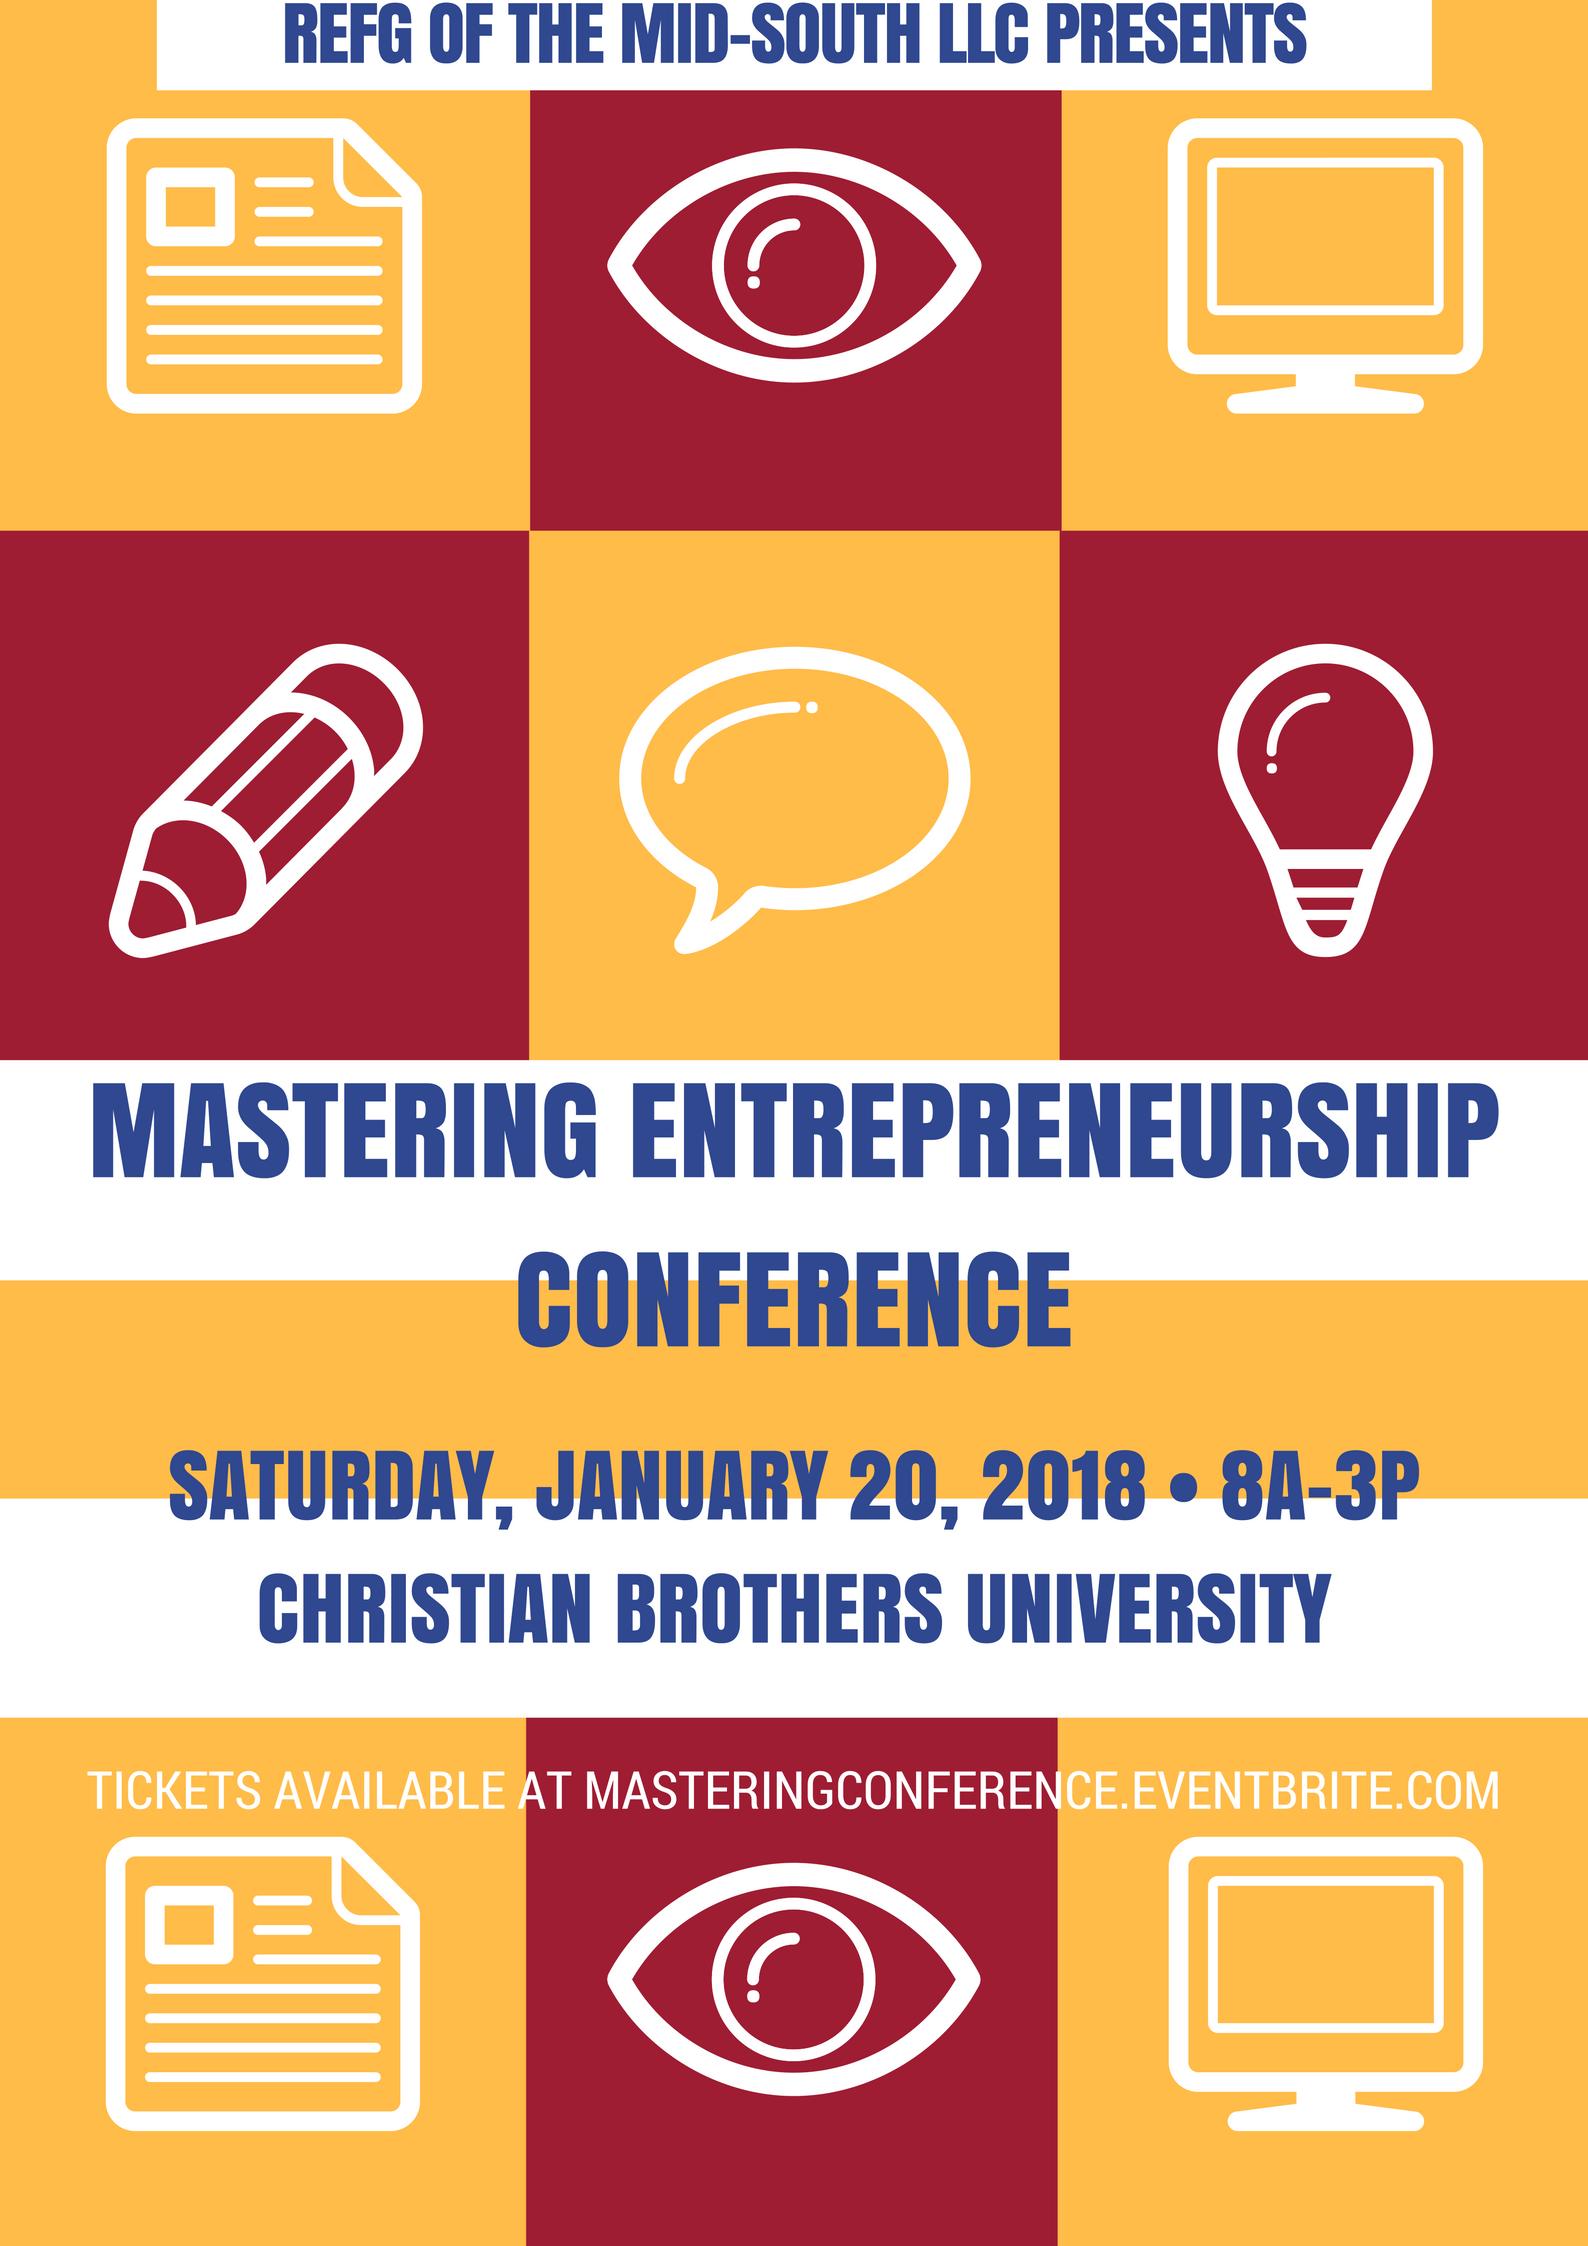 Mastering Entrepreneurship Conference